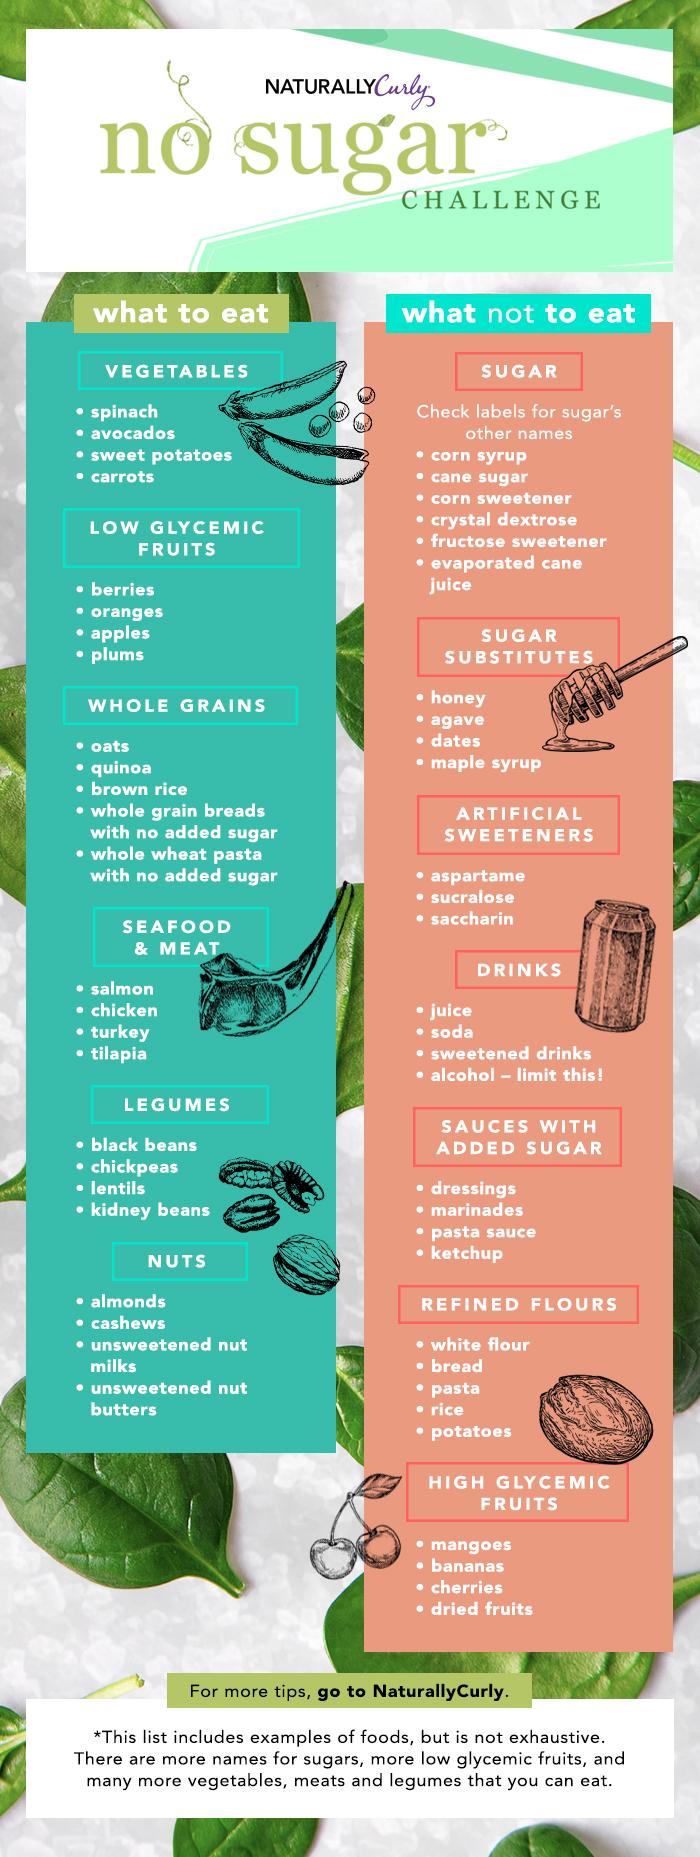 what to eat no sugar challenge